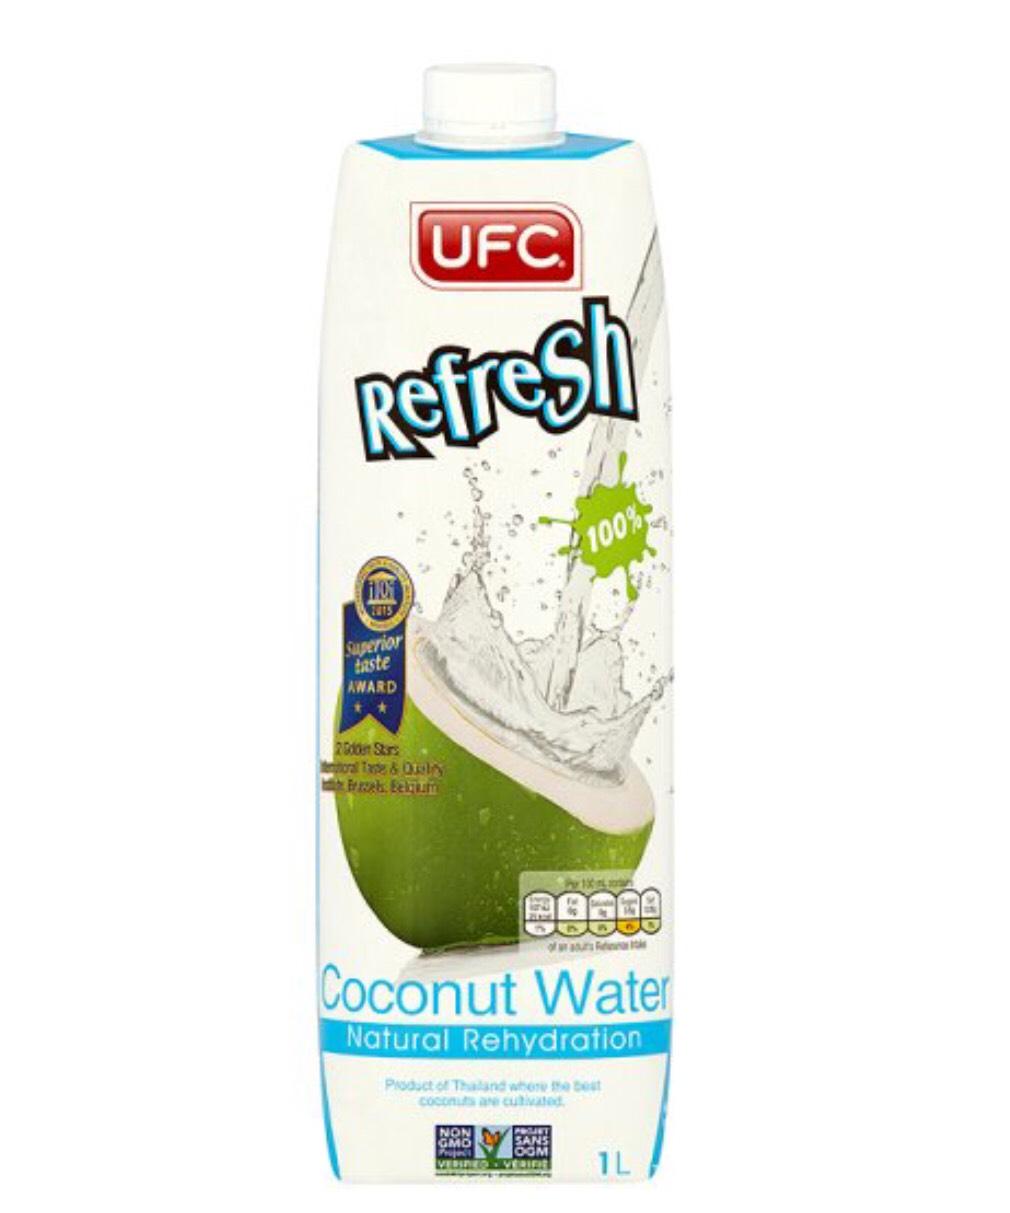 UFC Coconut Water 1L £1.50 at Asda